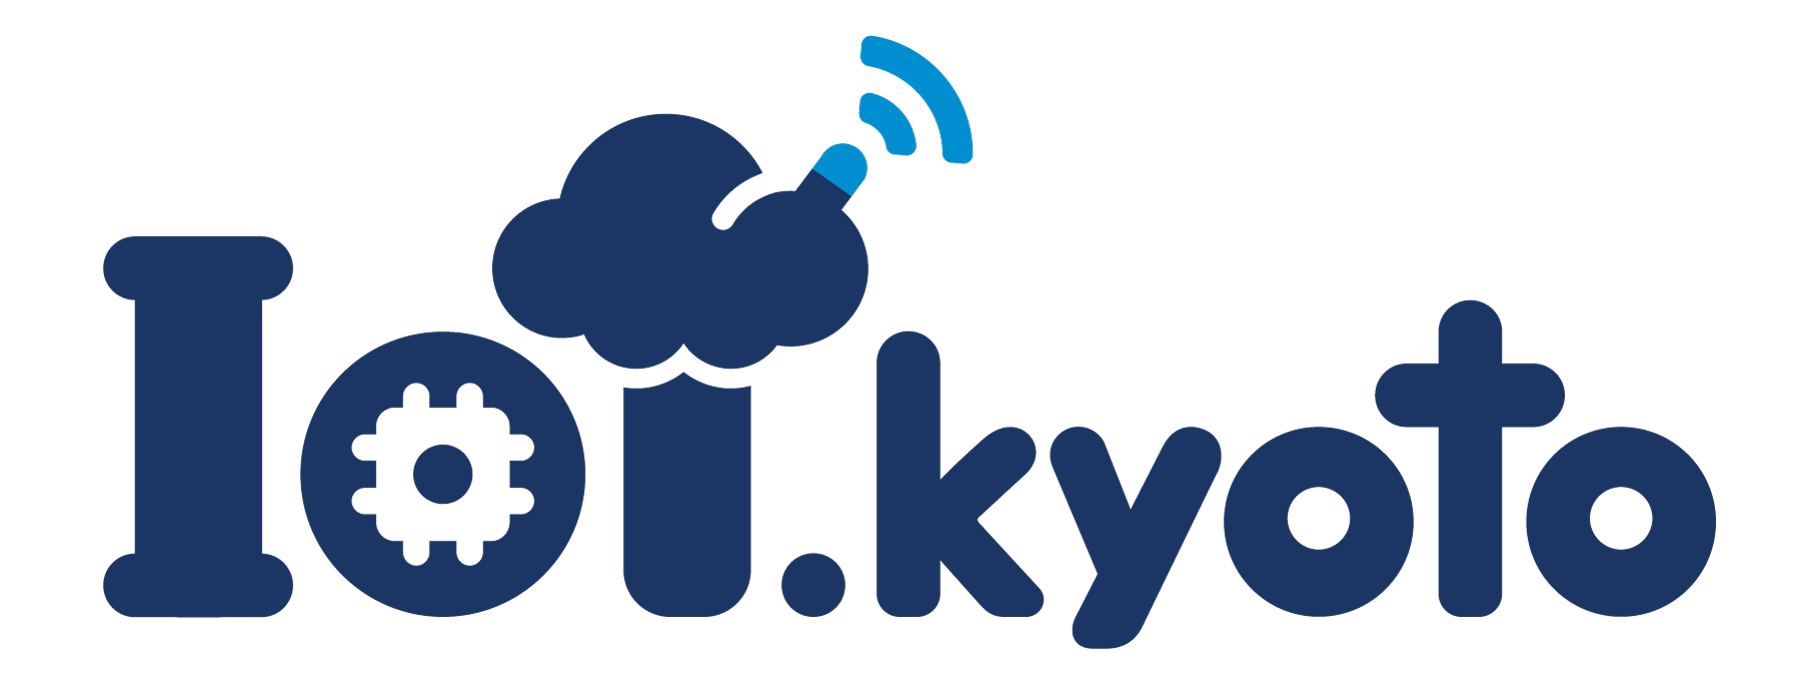 IoT.kyoto(株式会社KYOSO)